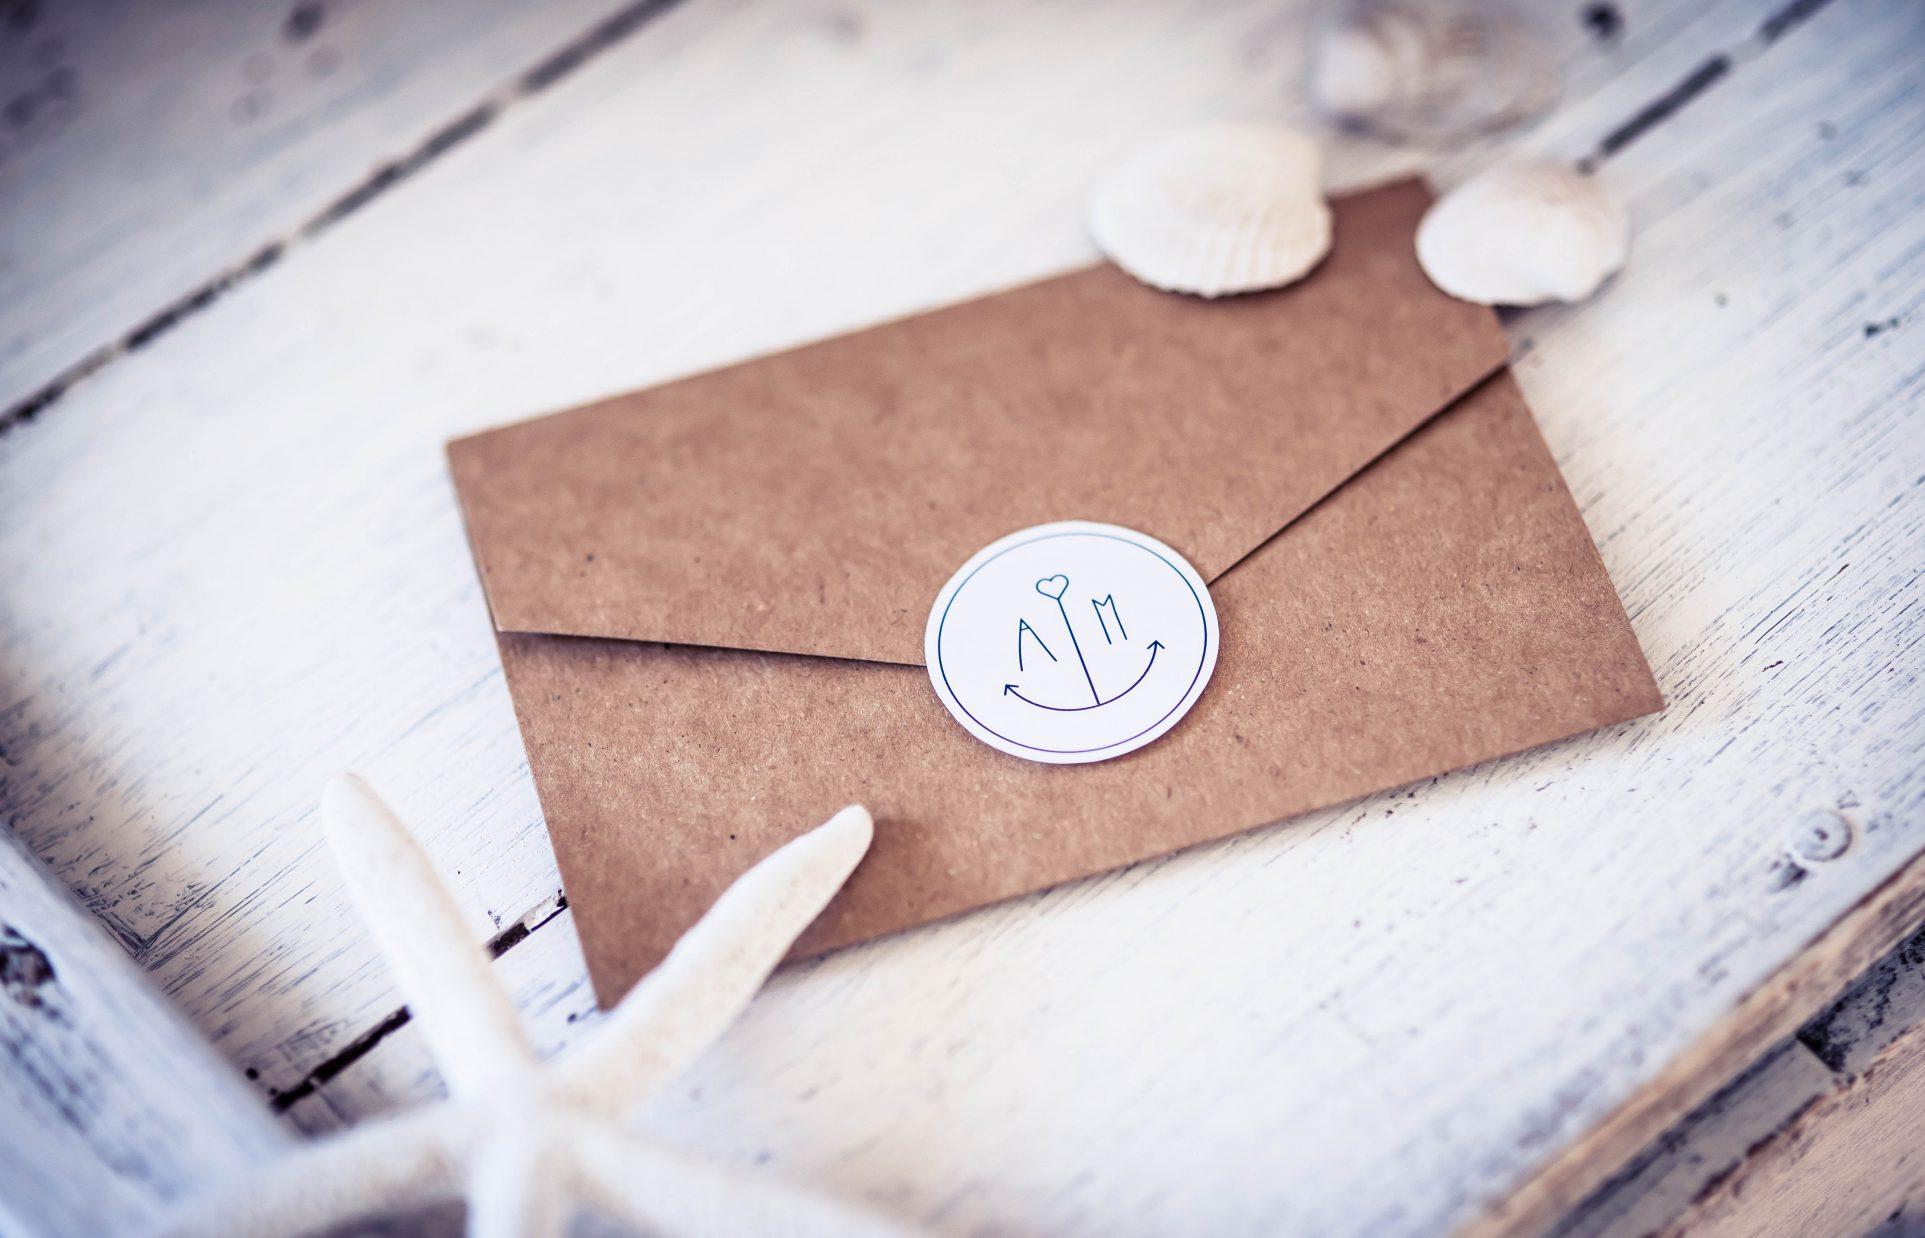 Pocketfoldkarte aus Kraftpapier